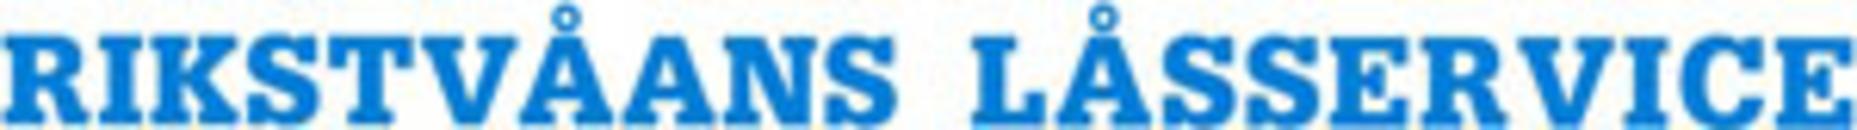 Rikstvåans Låsservice logo